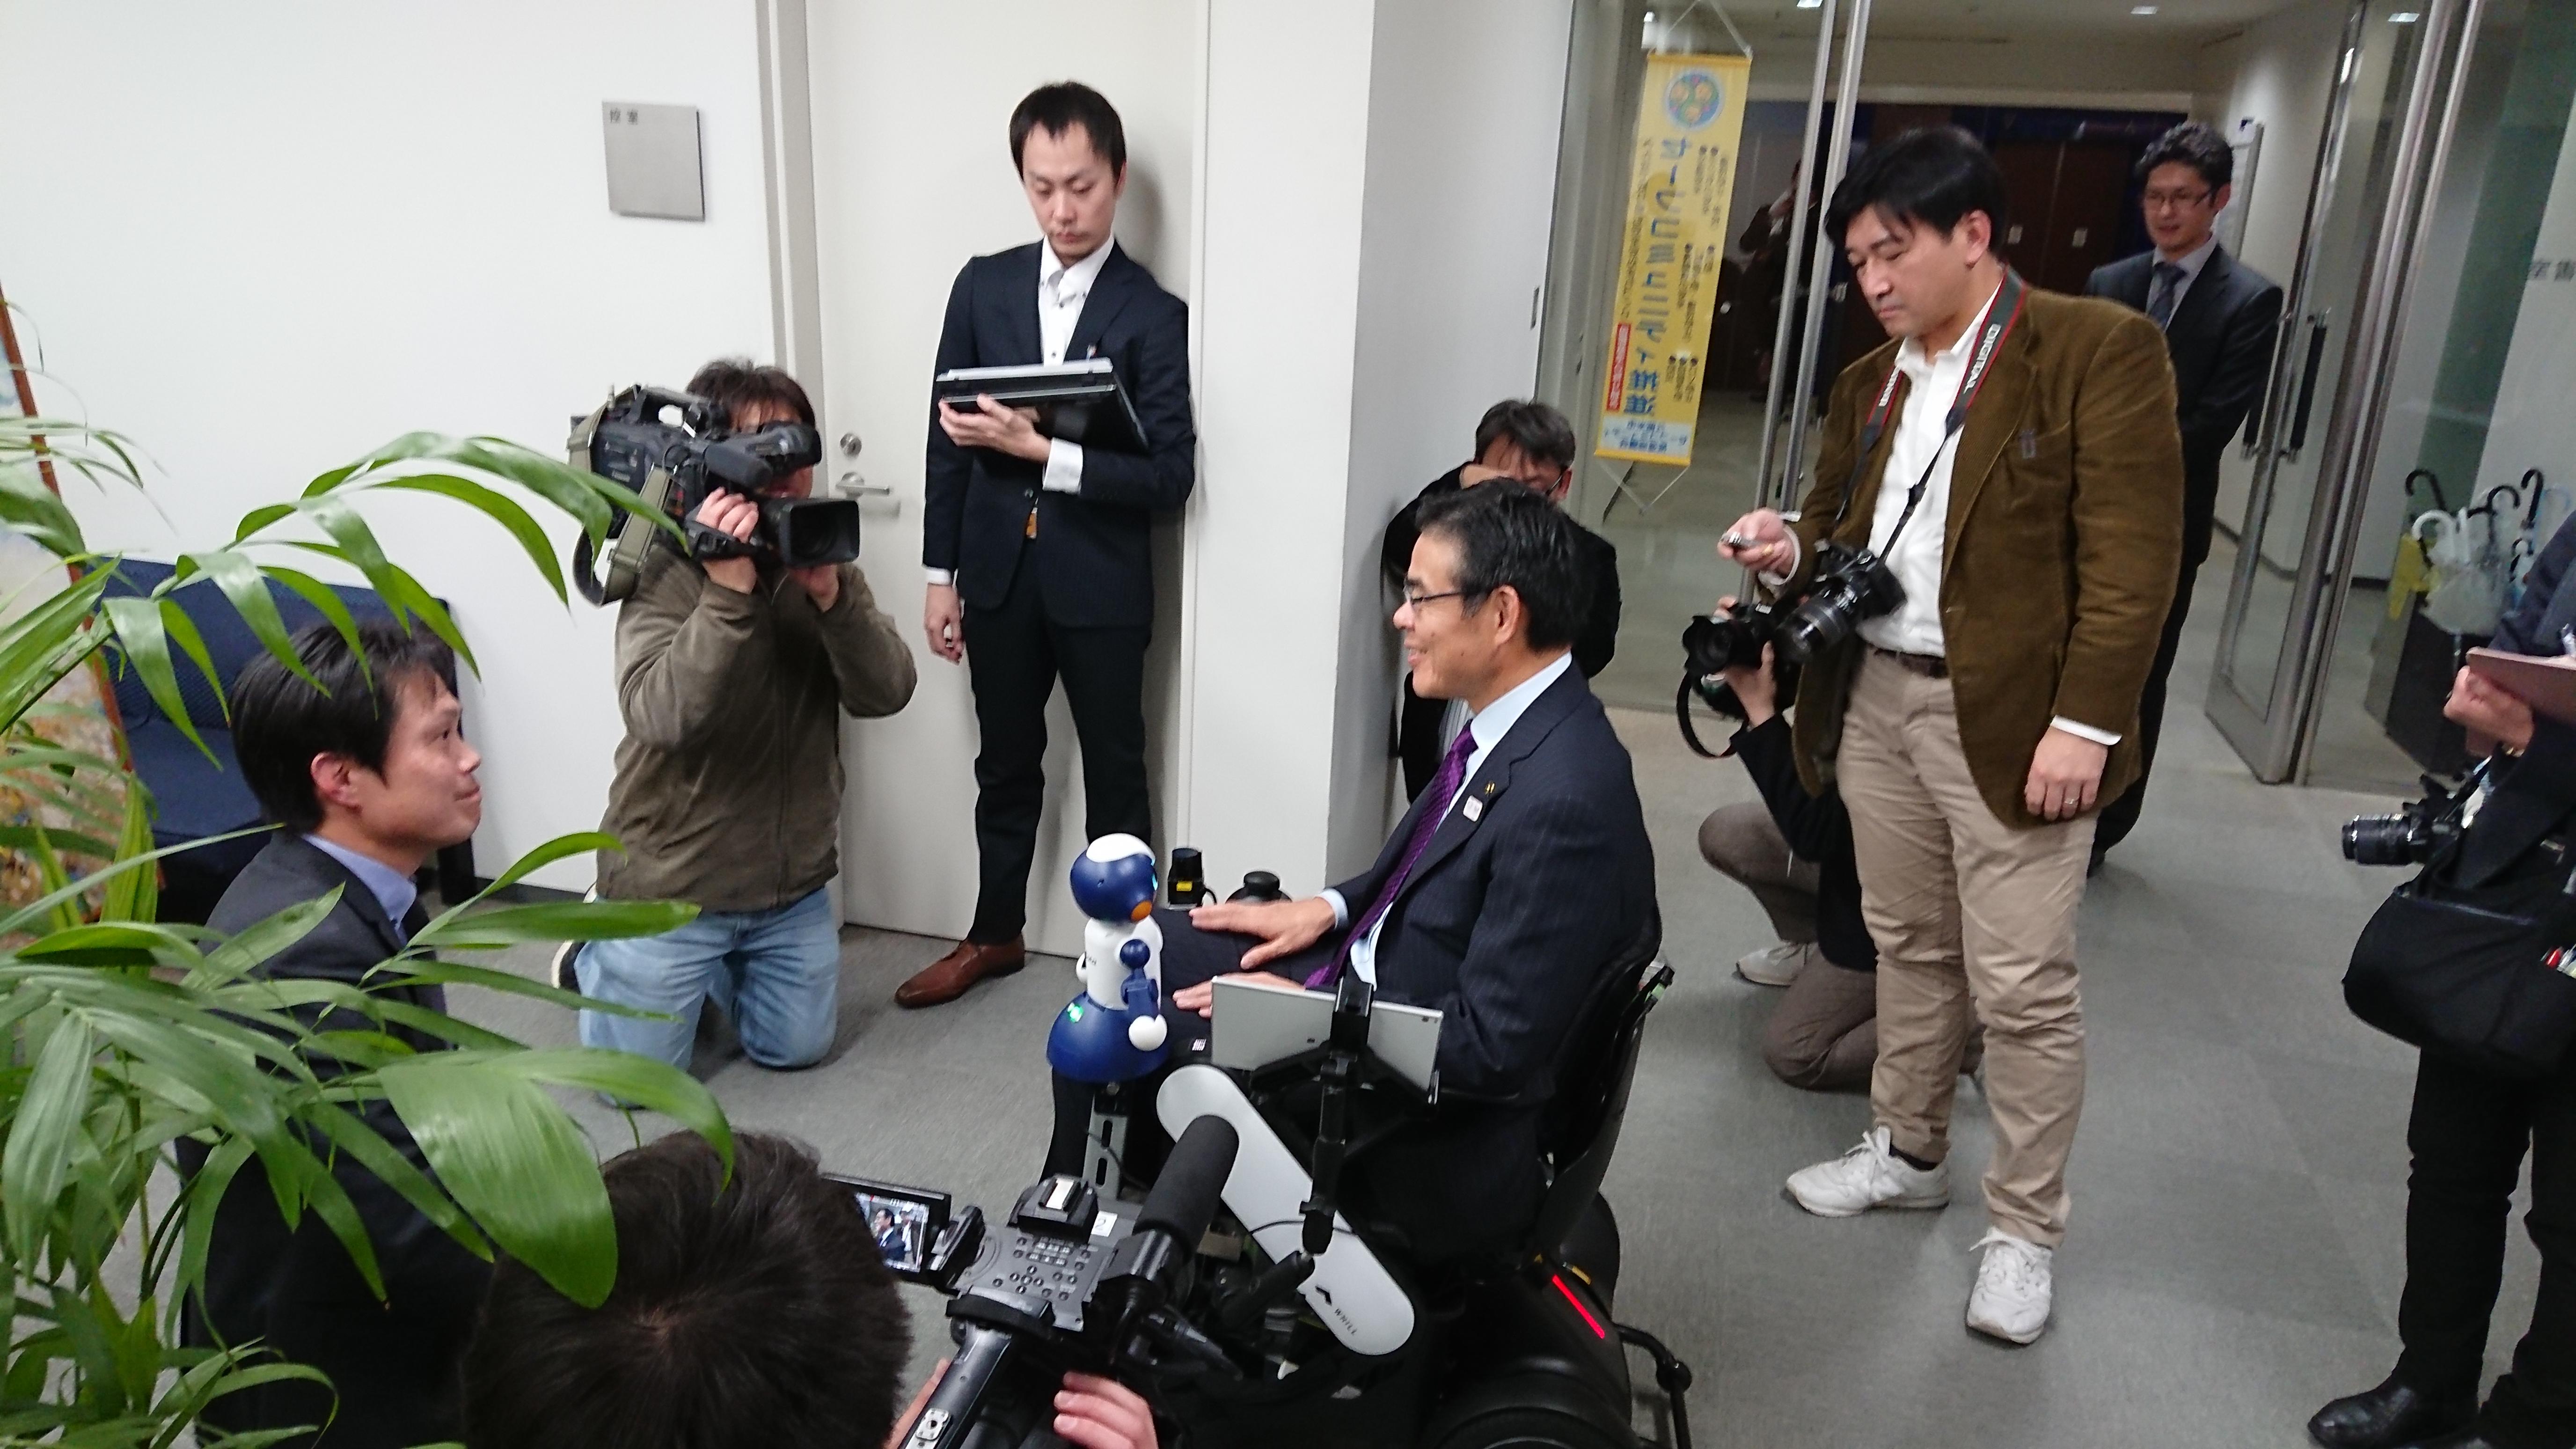 http://www.kurume-it.ac.jp/news/pdf/DSC_0598.JPG